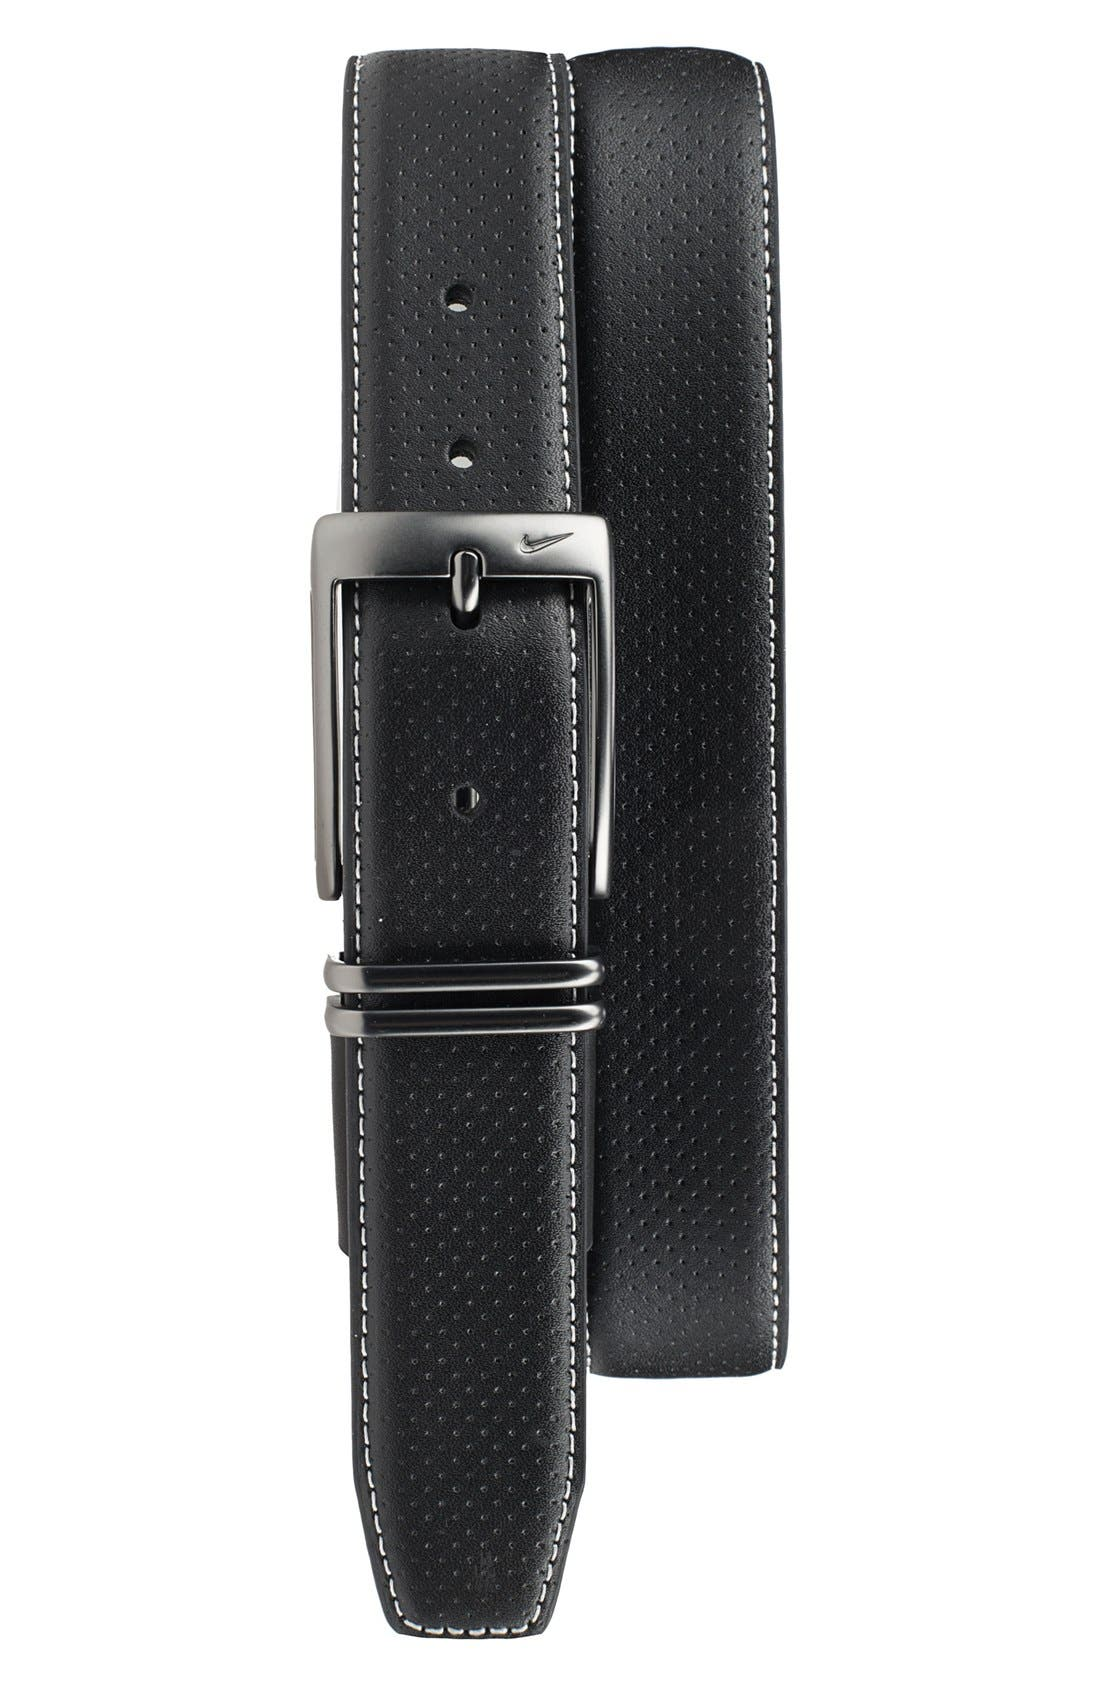 Nike Perforated Leather Belt, Black